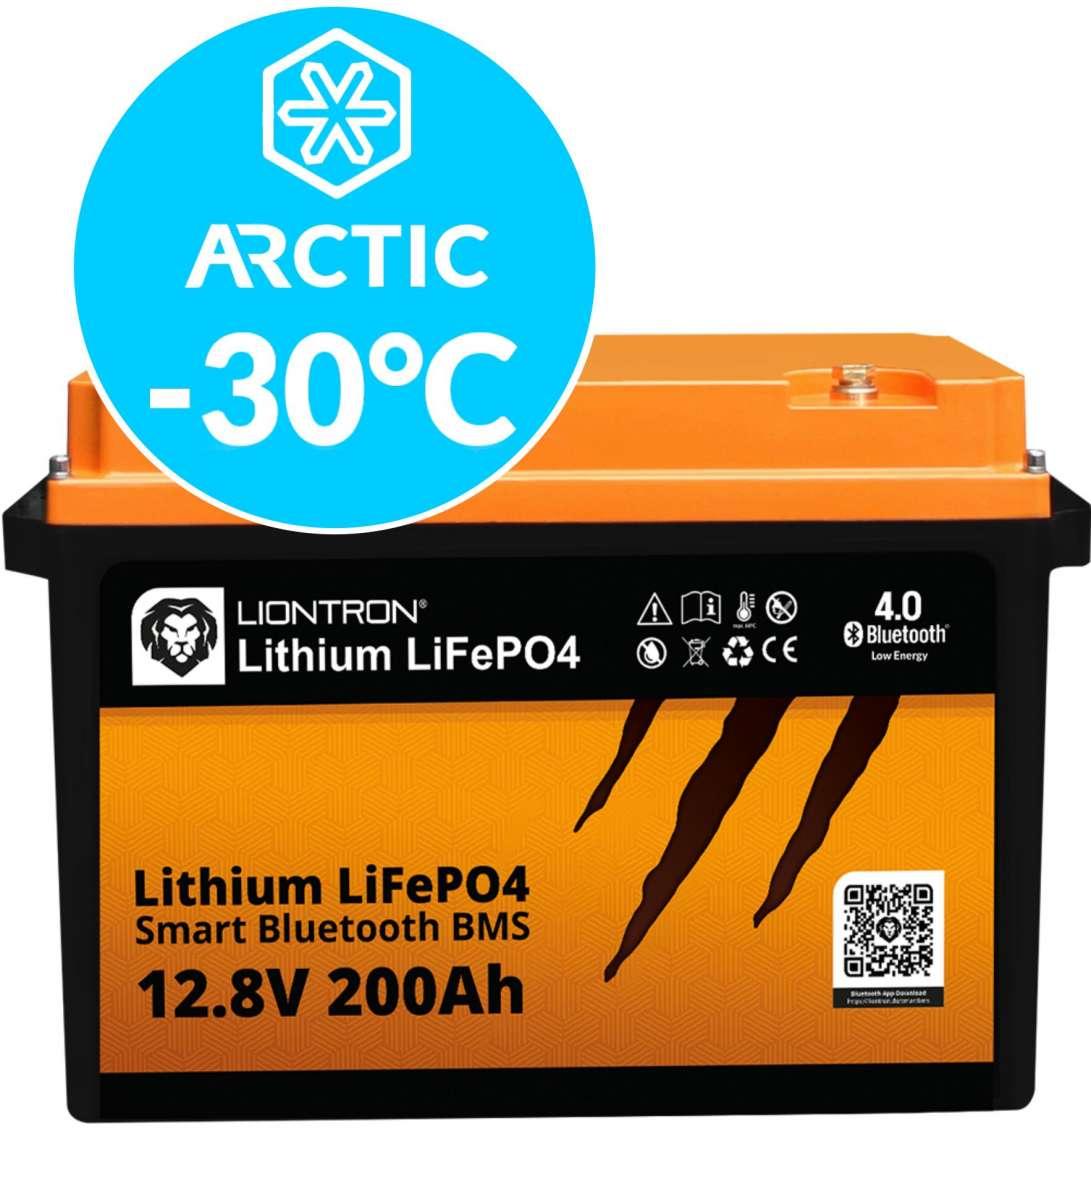 Liontron LiFePO4 LX Smart BMS 12.8V 200Ah Arctic 6